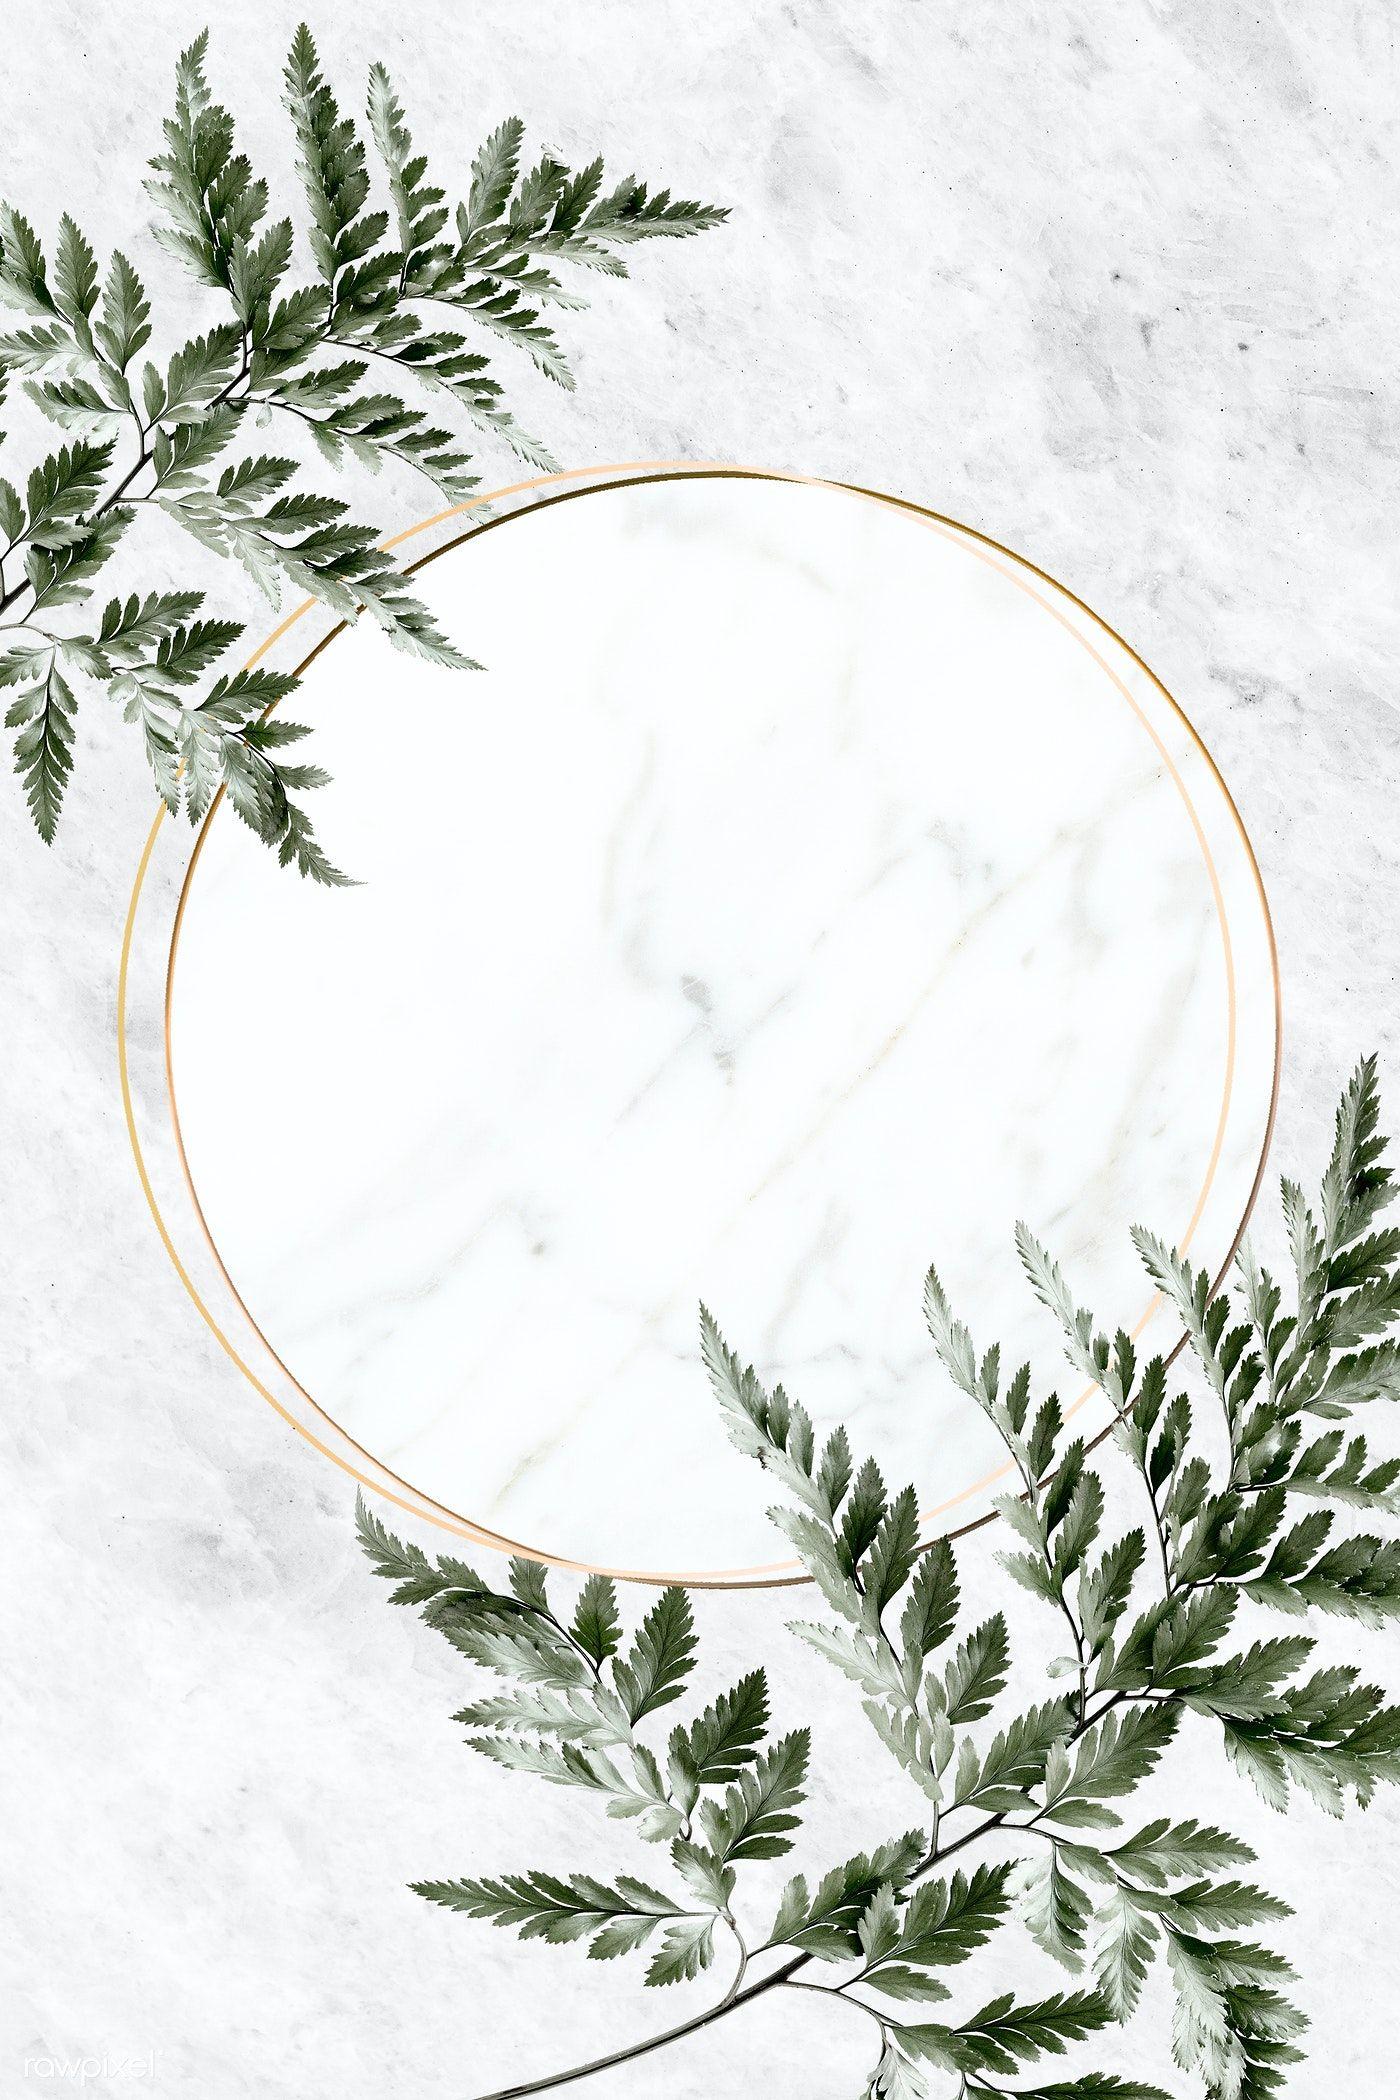 Download premium illustration of Round golden frame on a marble background